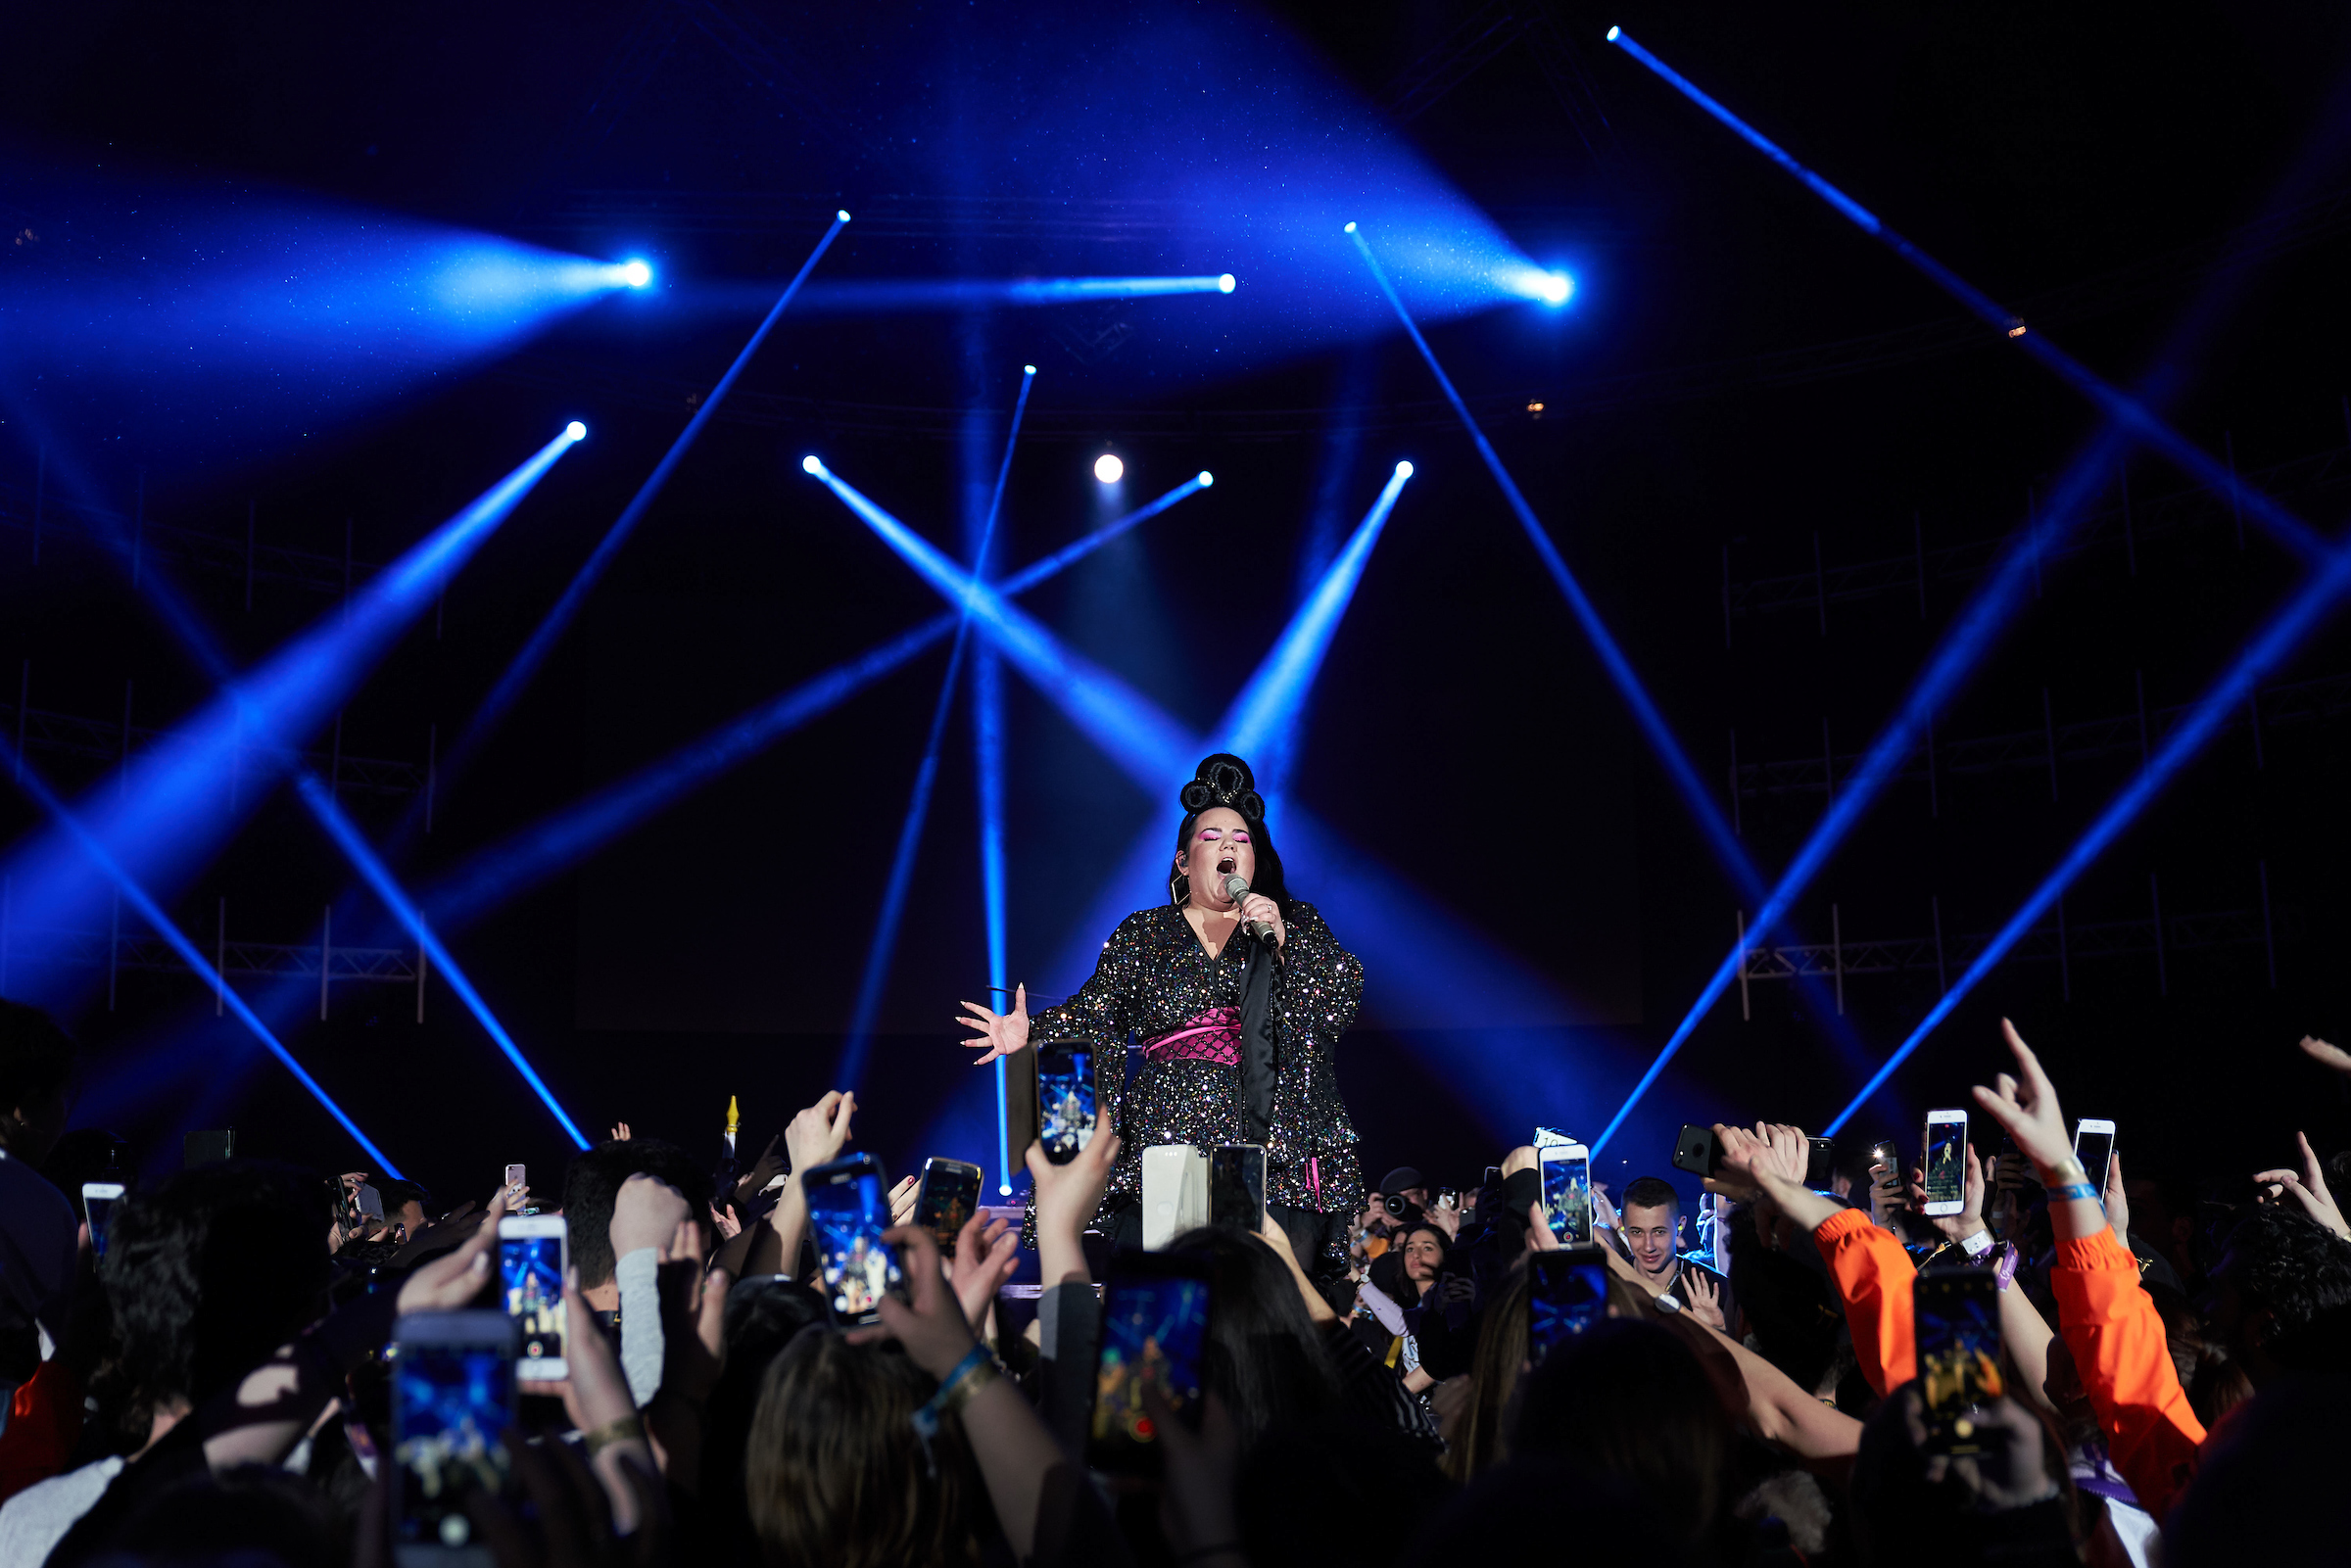 Eurovision Song Contest 2019 Kate Miller Heidke to represent Australia